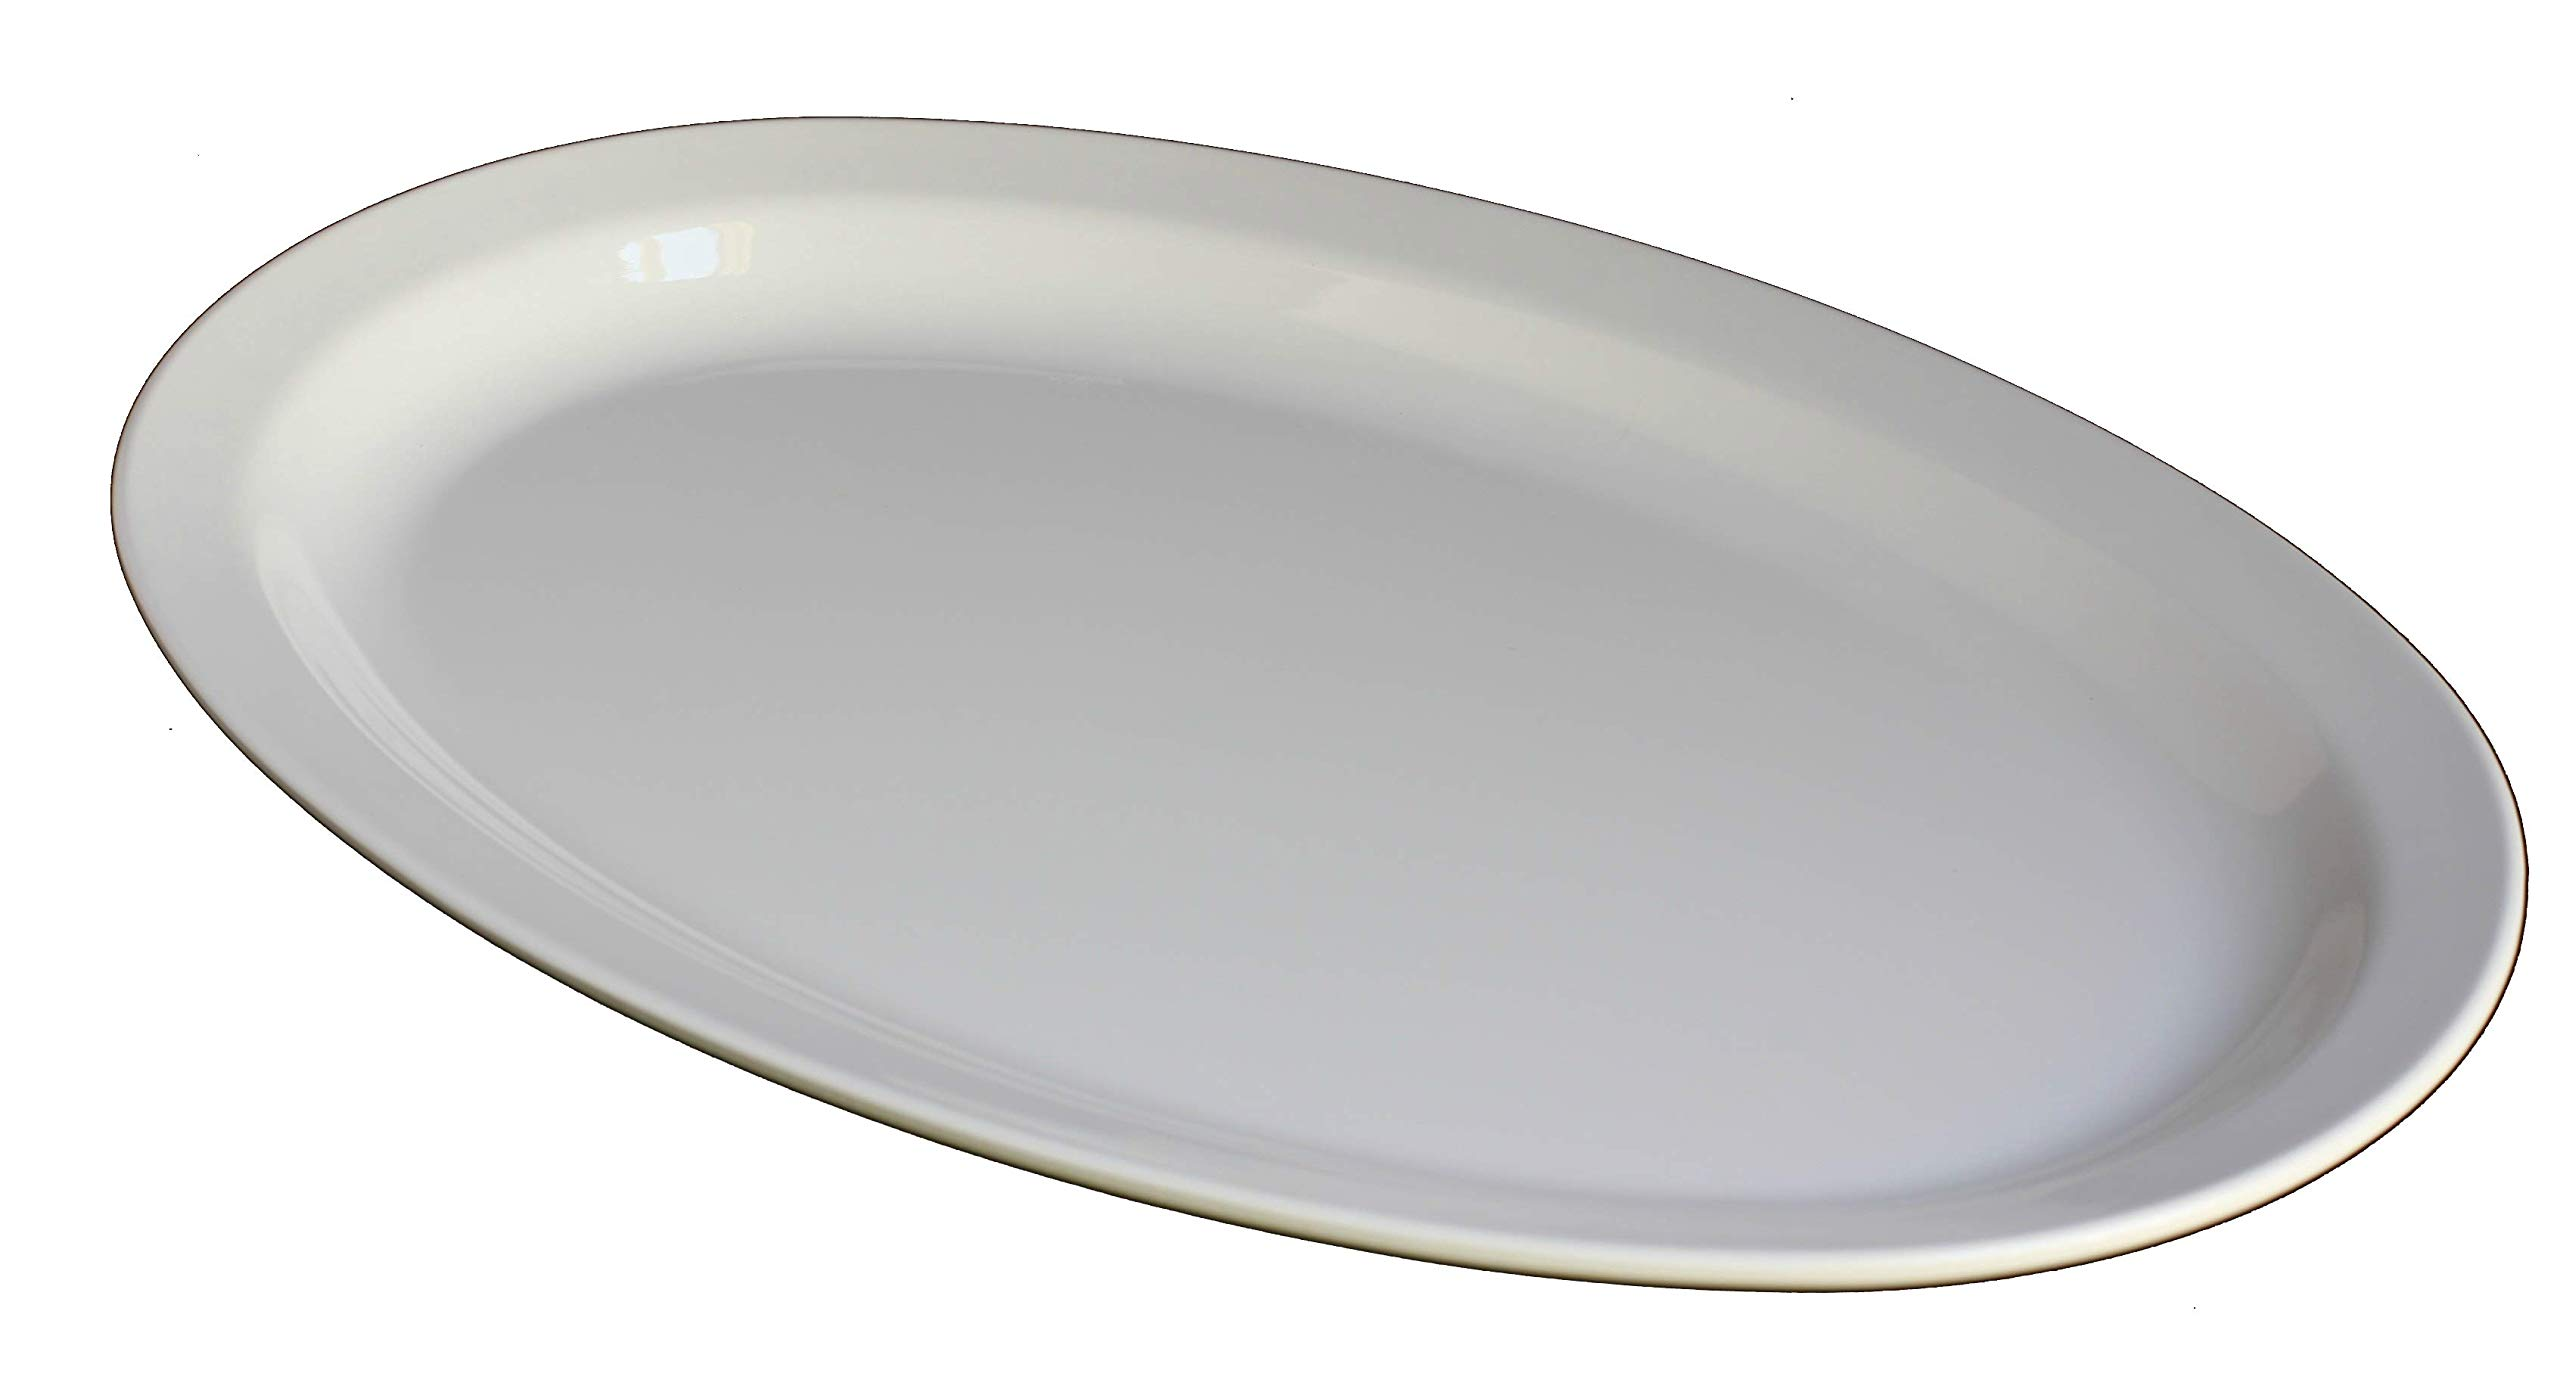 Z-Moments Western Melamine 513 Oval Plate Narrow Rim Platter 13'' X 8-1/2'', 48-pcs per case (4 dozen) NSF (White)